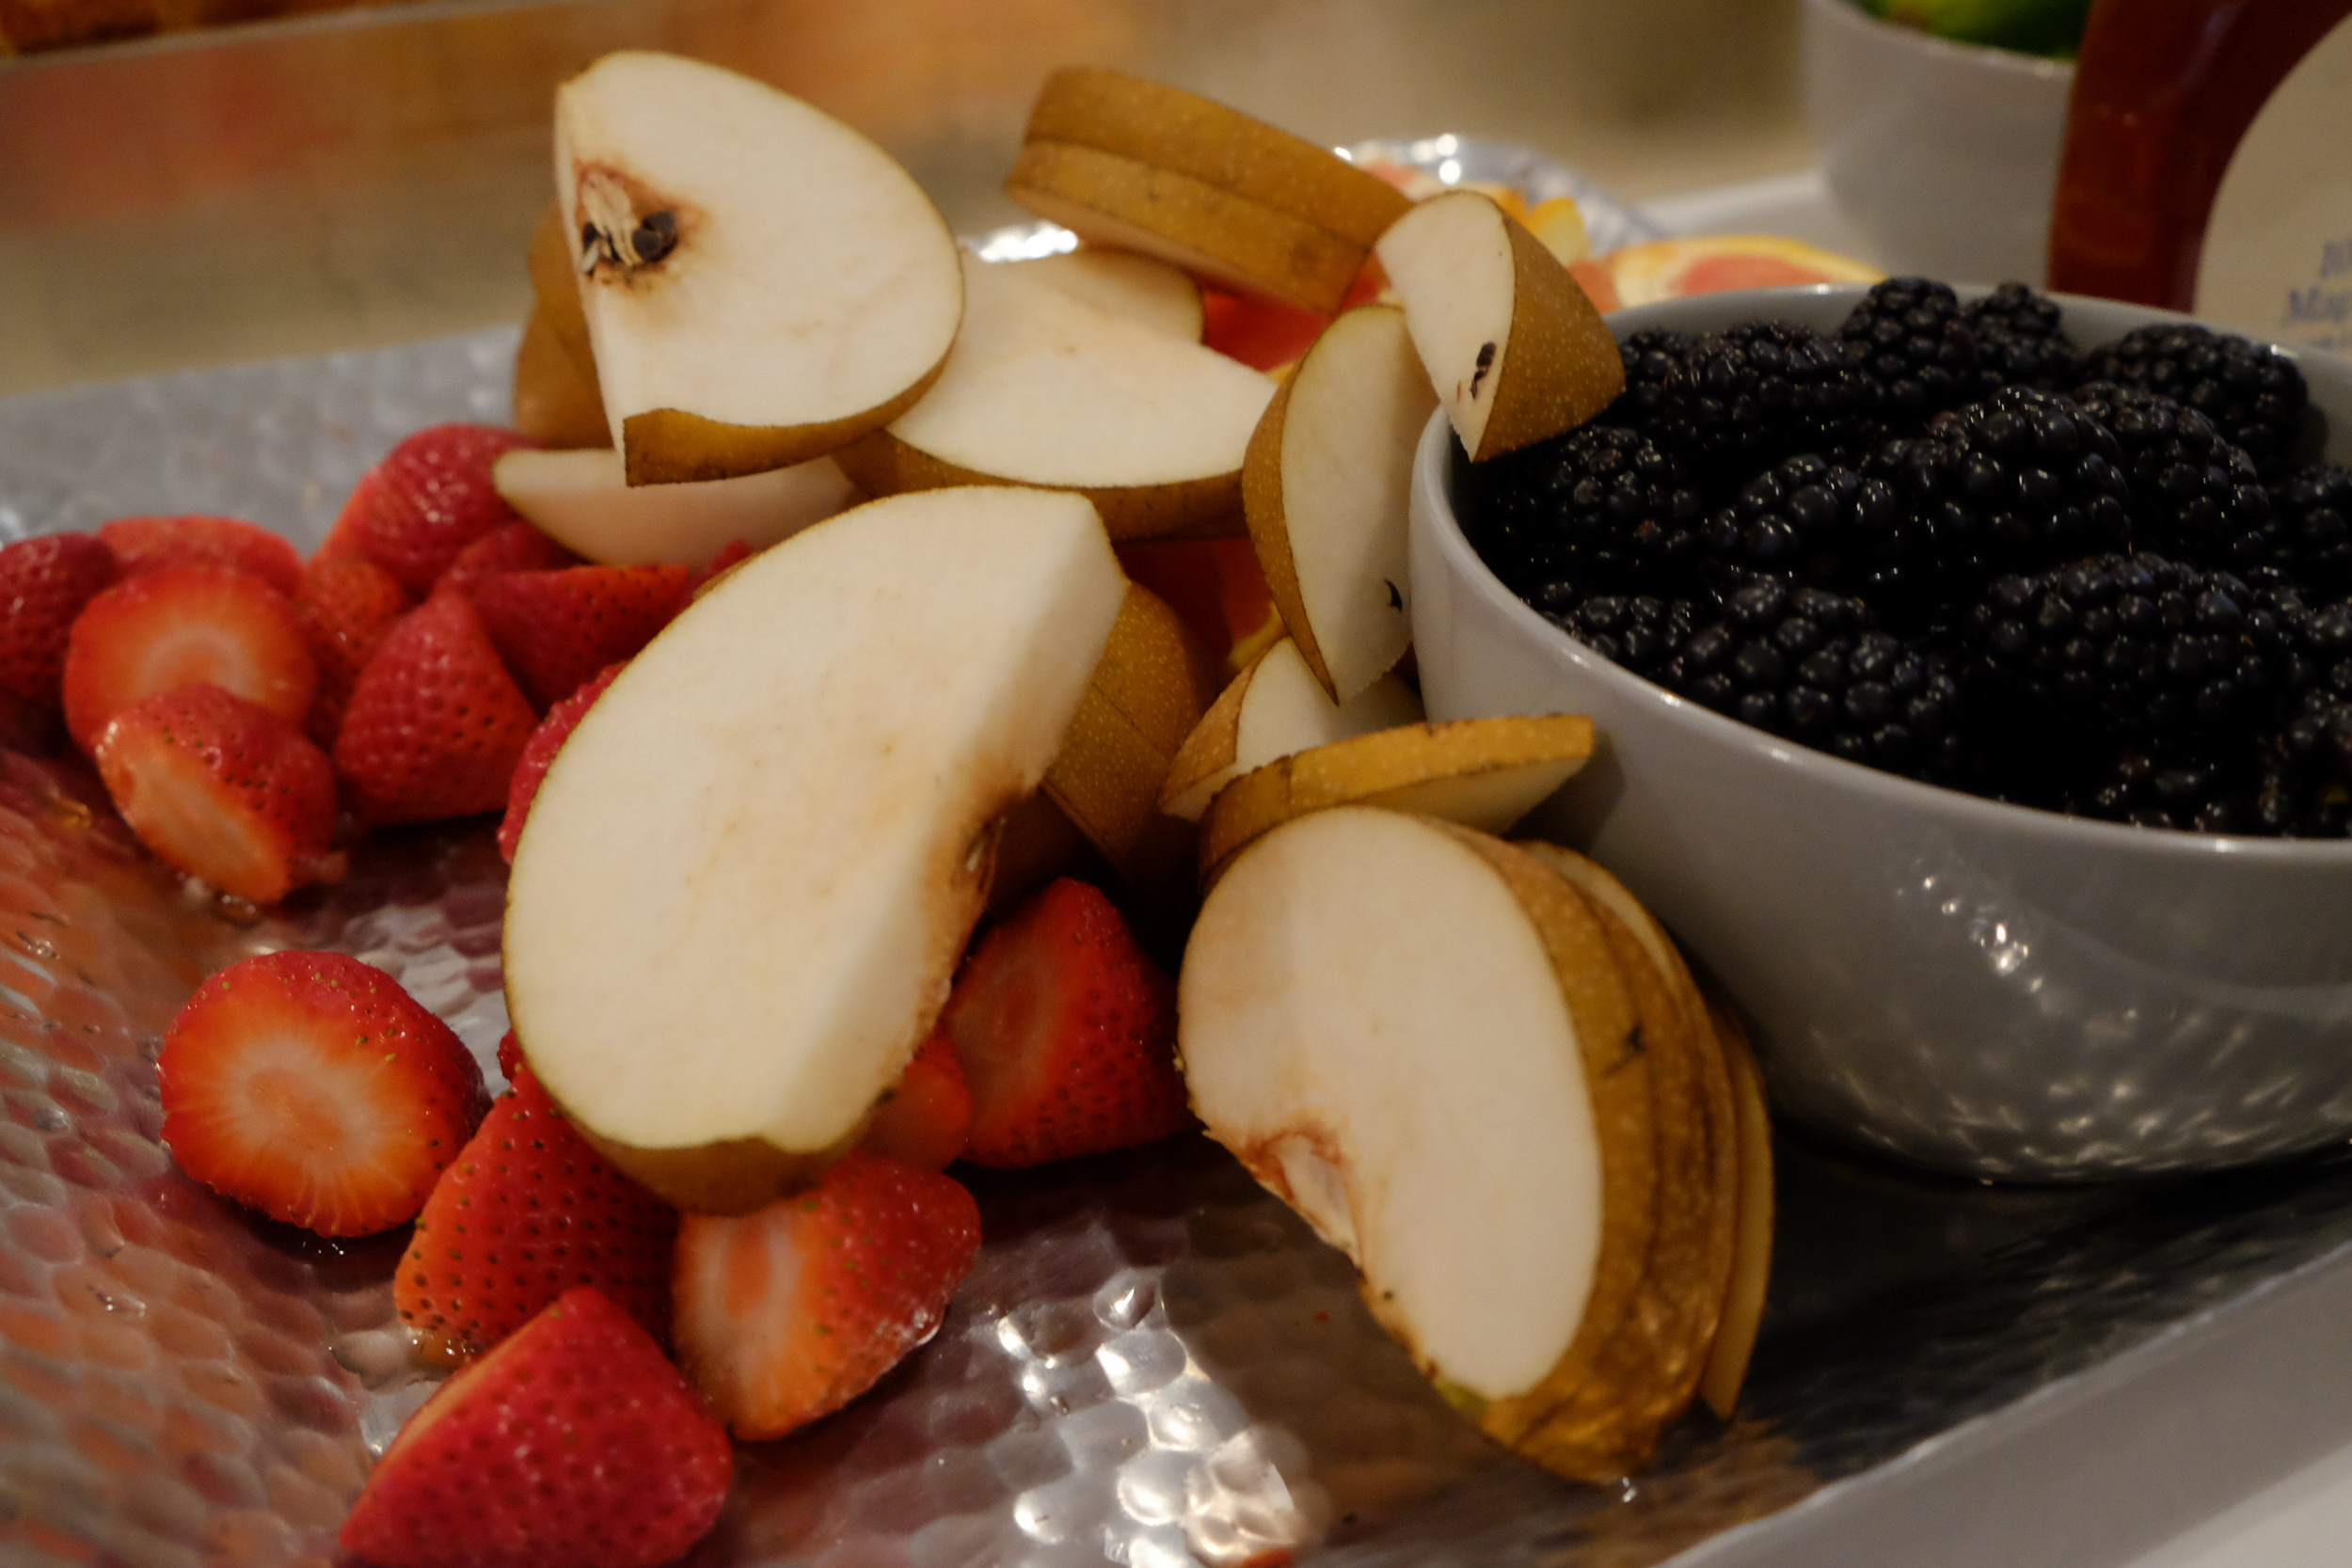 Fruit Plate // Photo Credit: Cesar Fabello